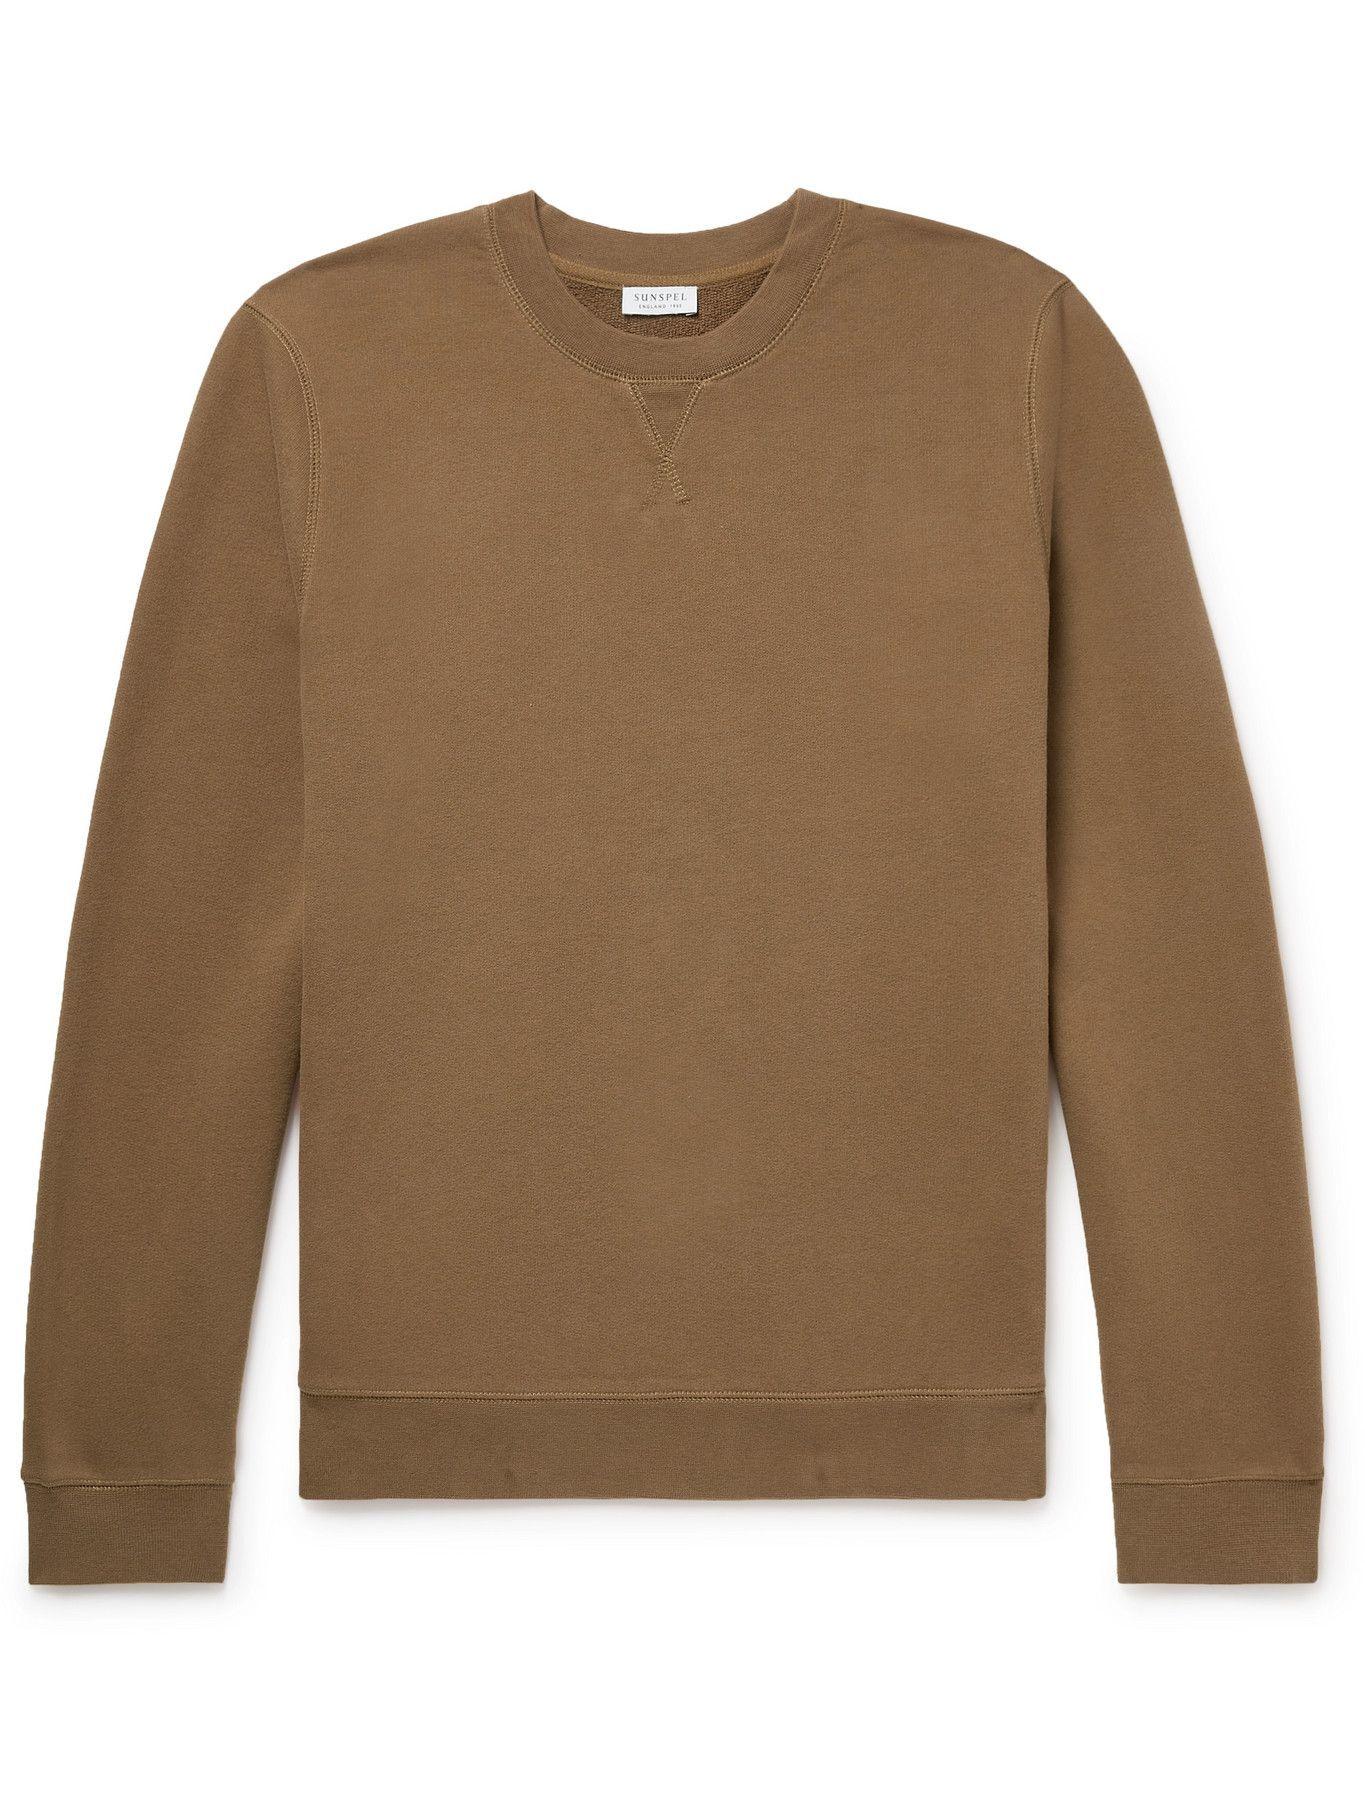 Photo: Sunspel - Brushed Loopback Cotton-Jersey Sweatshirt - Brown